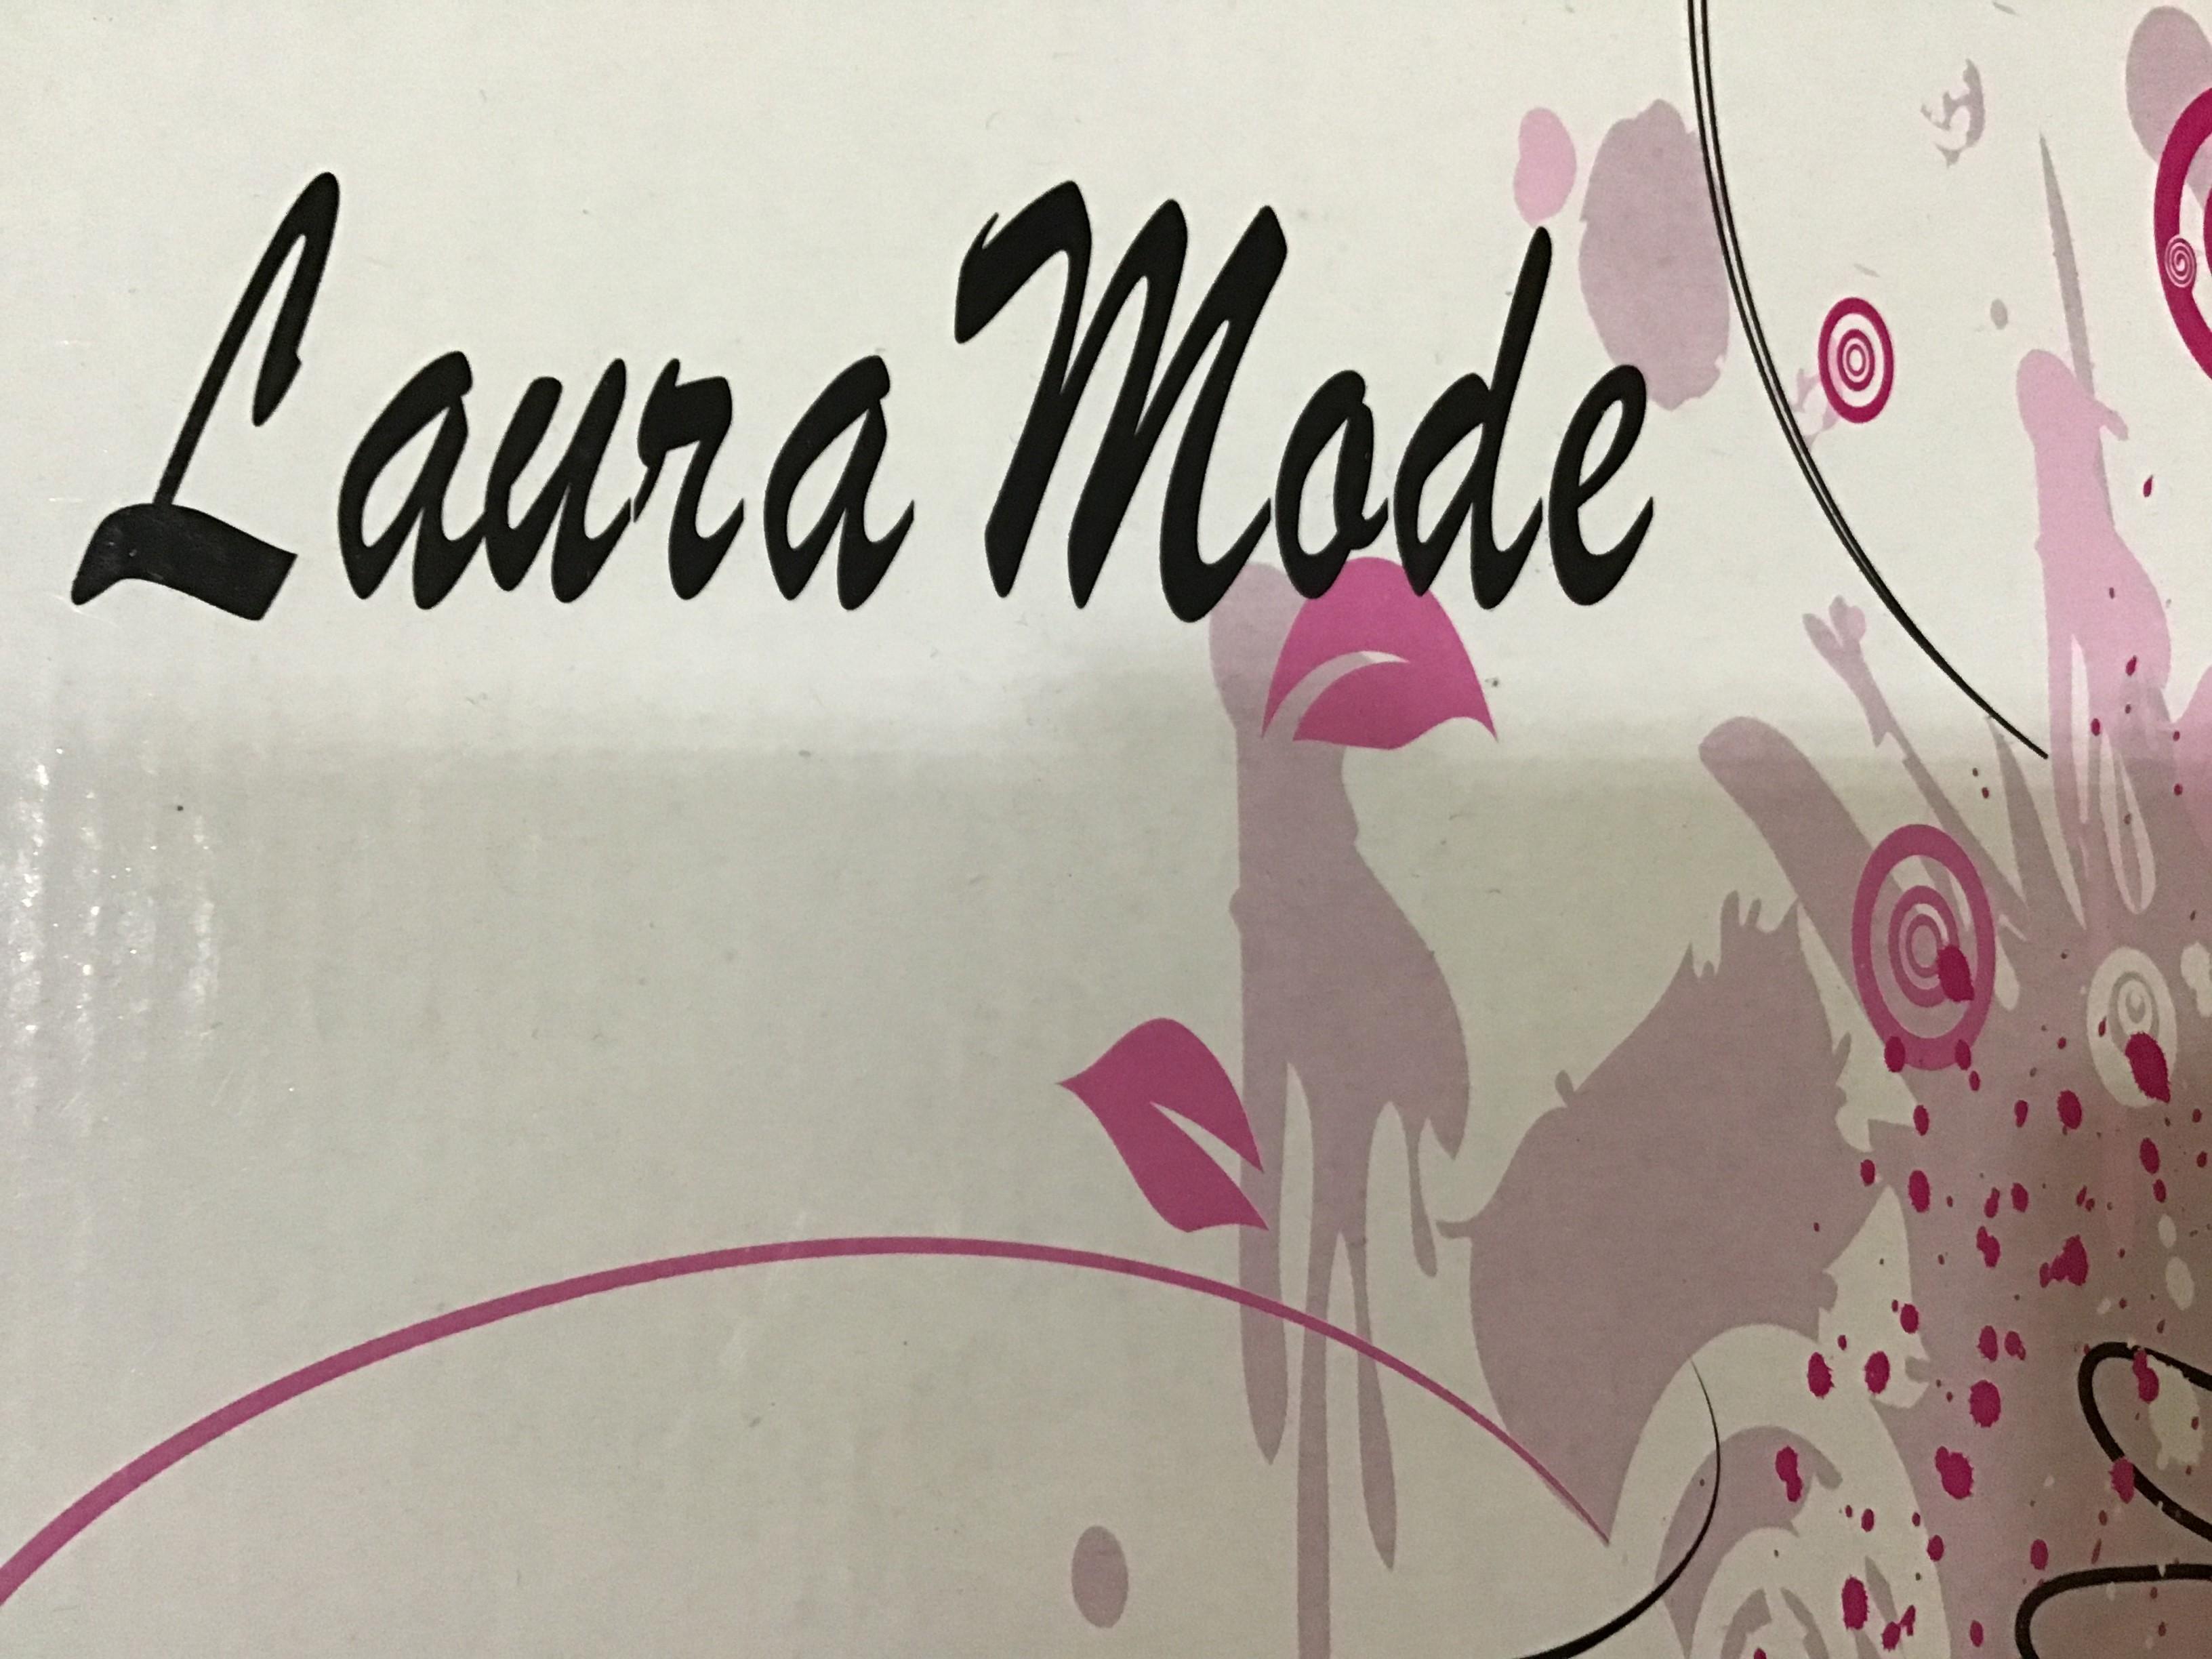 Laura mode